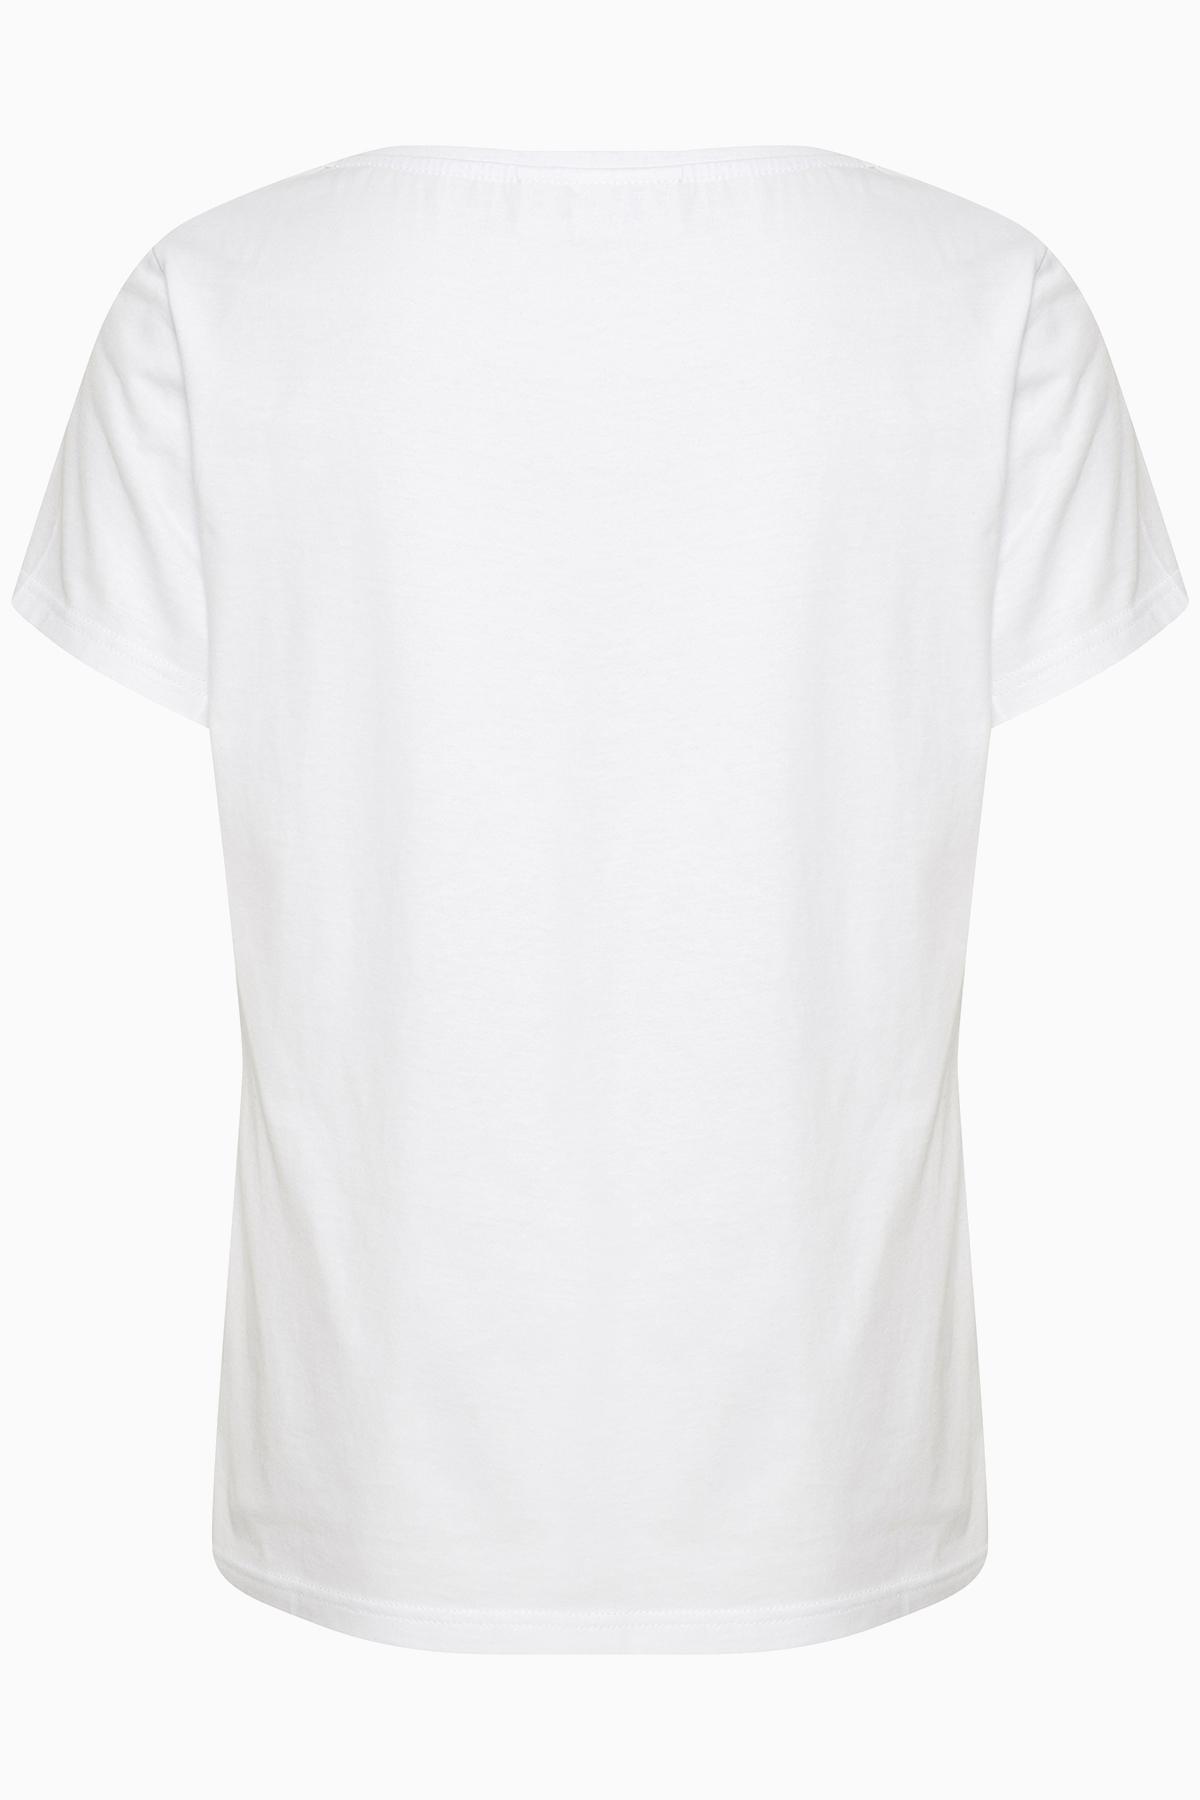 Off-white/grön Kortärmad T-shirt från Kaffe – Köp Off-white/grön Kortärmad T-shirt från stl. XS-XXL här